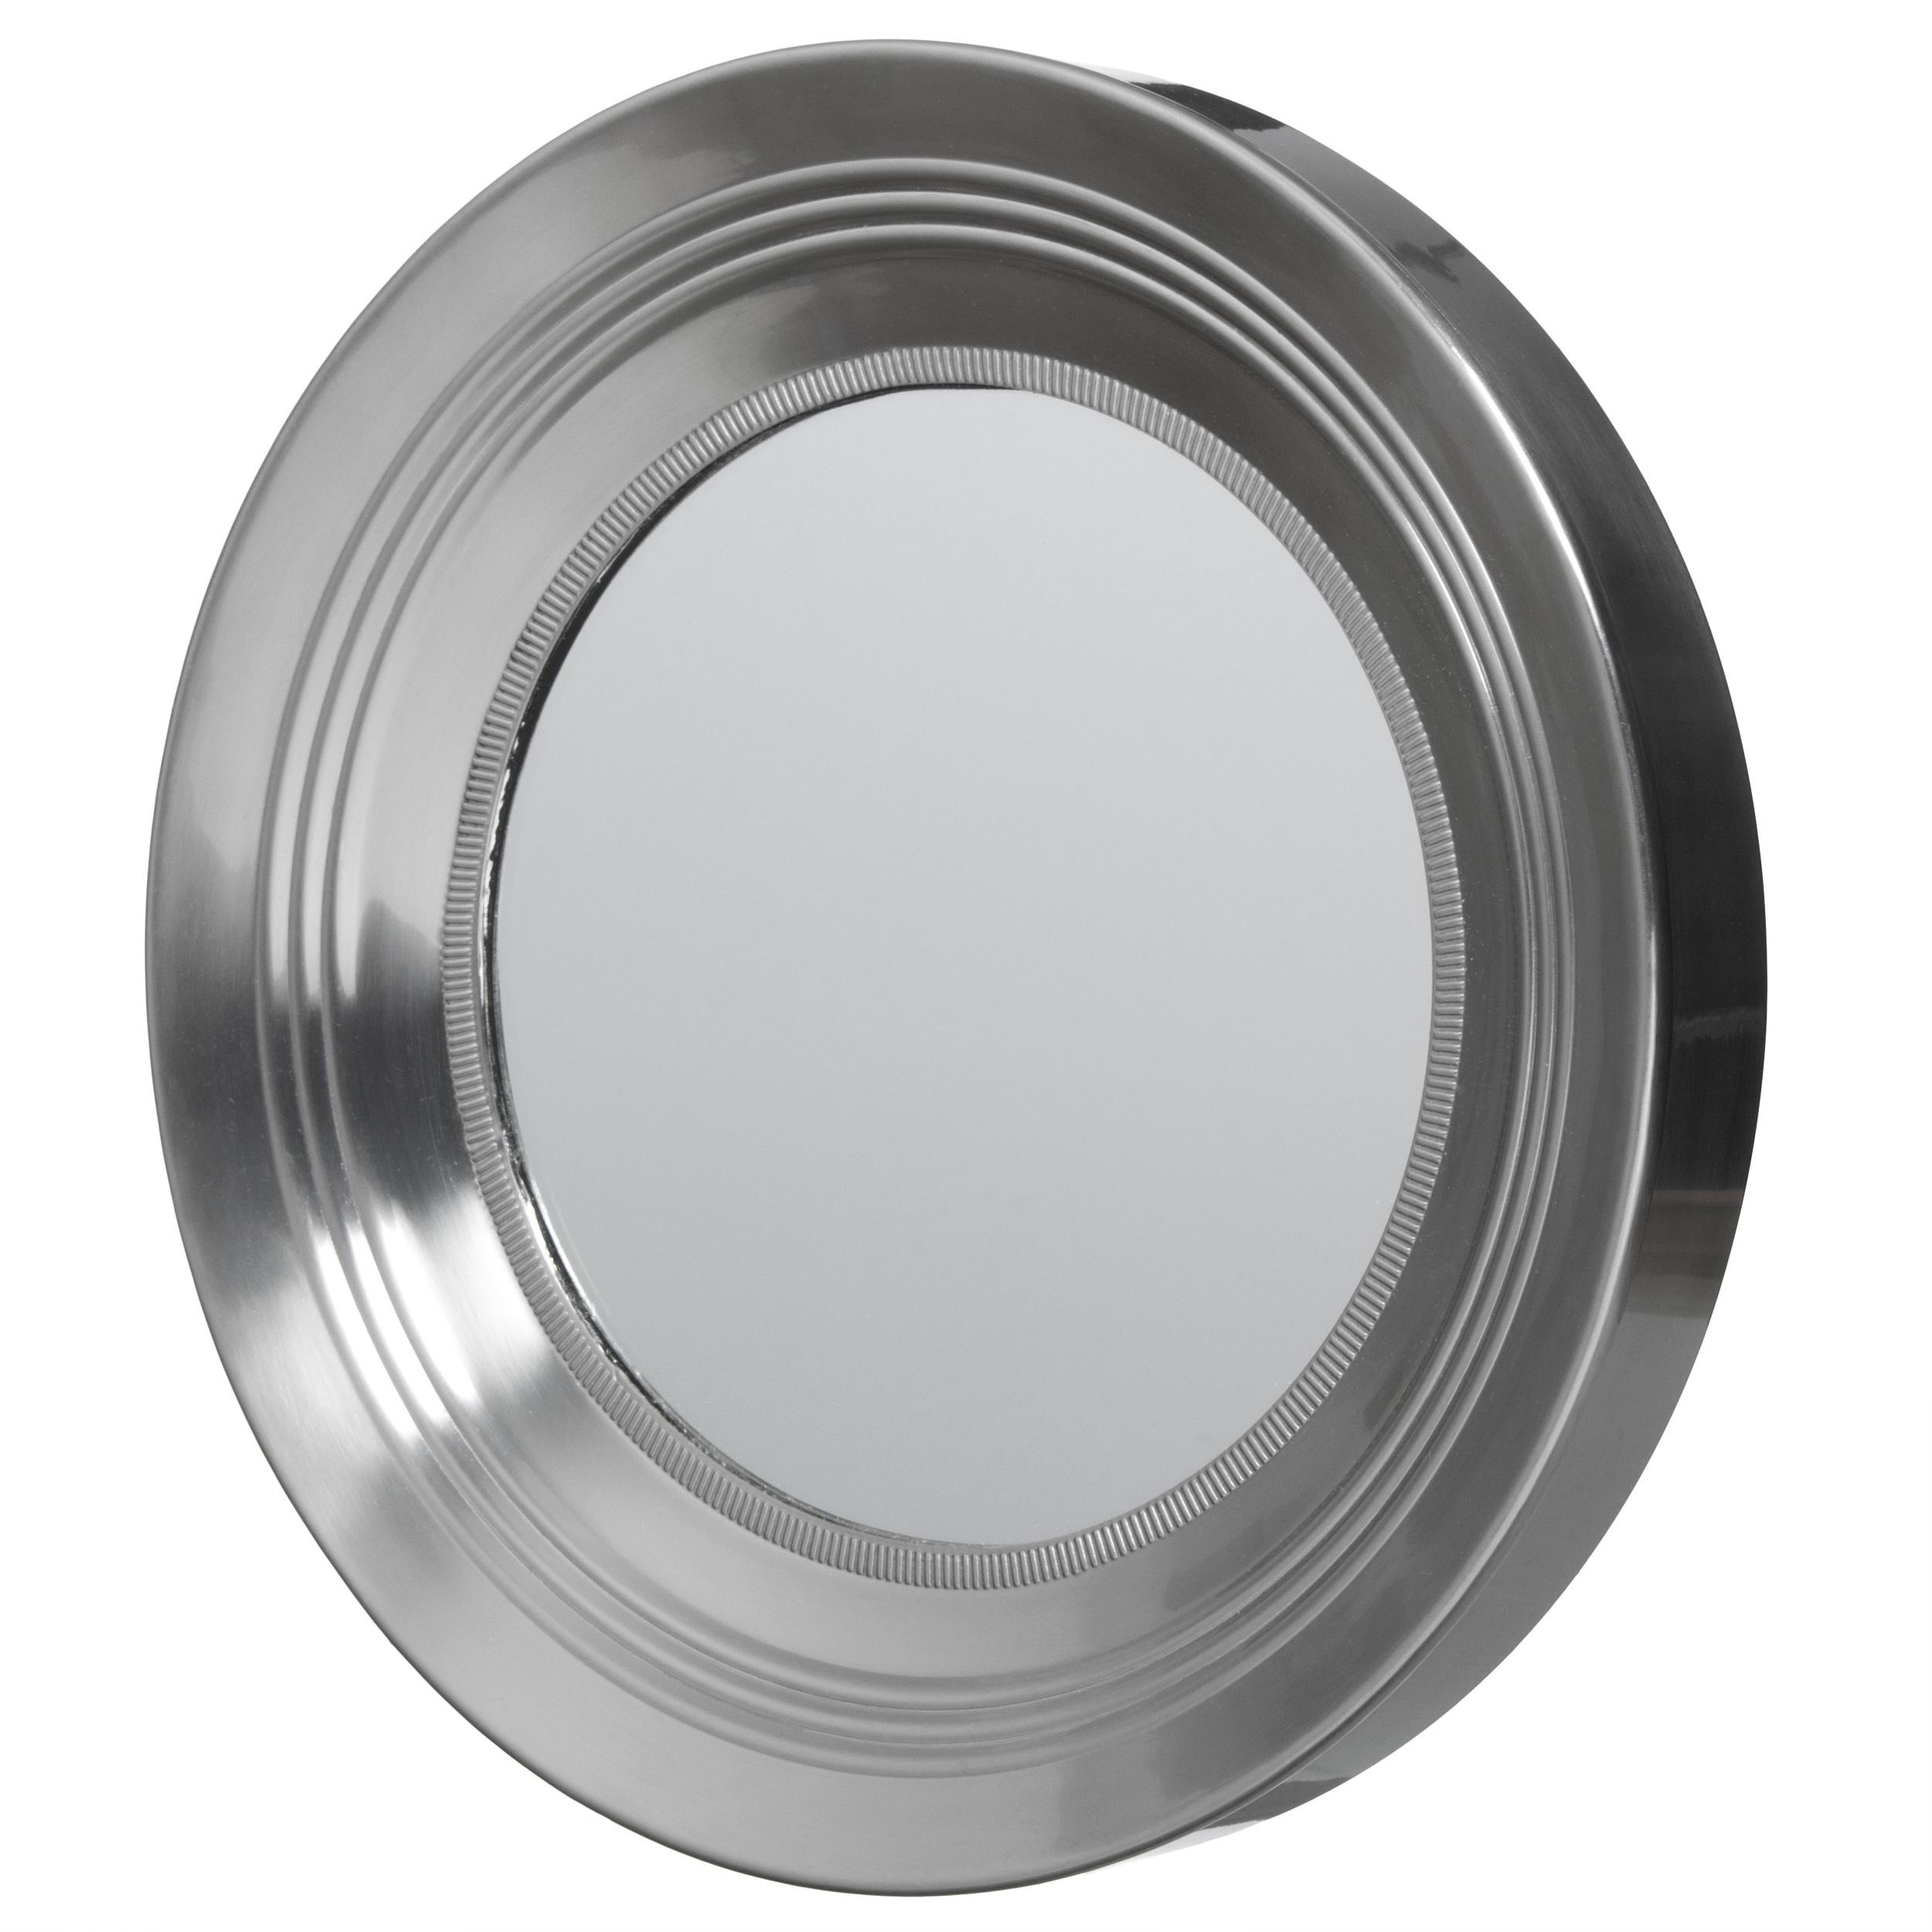 Furniture Various Sizes For Chrome Porthole Mirror At Overstock For Chrome Porthole Mirror (View 10 of 15)